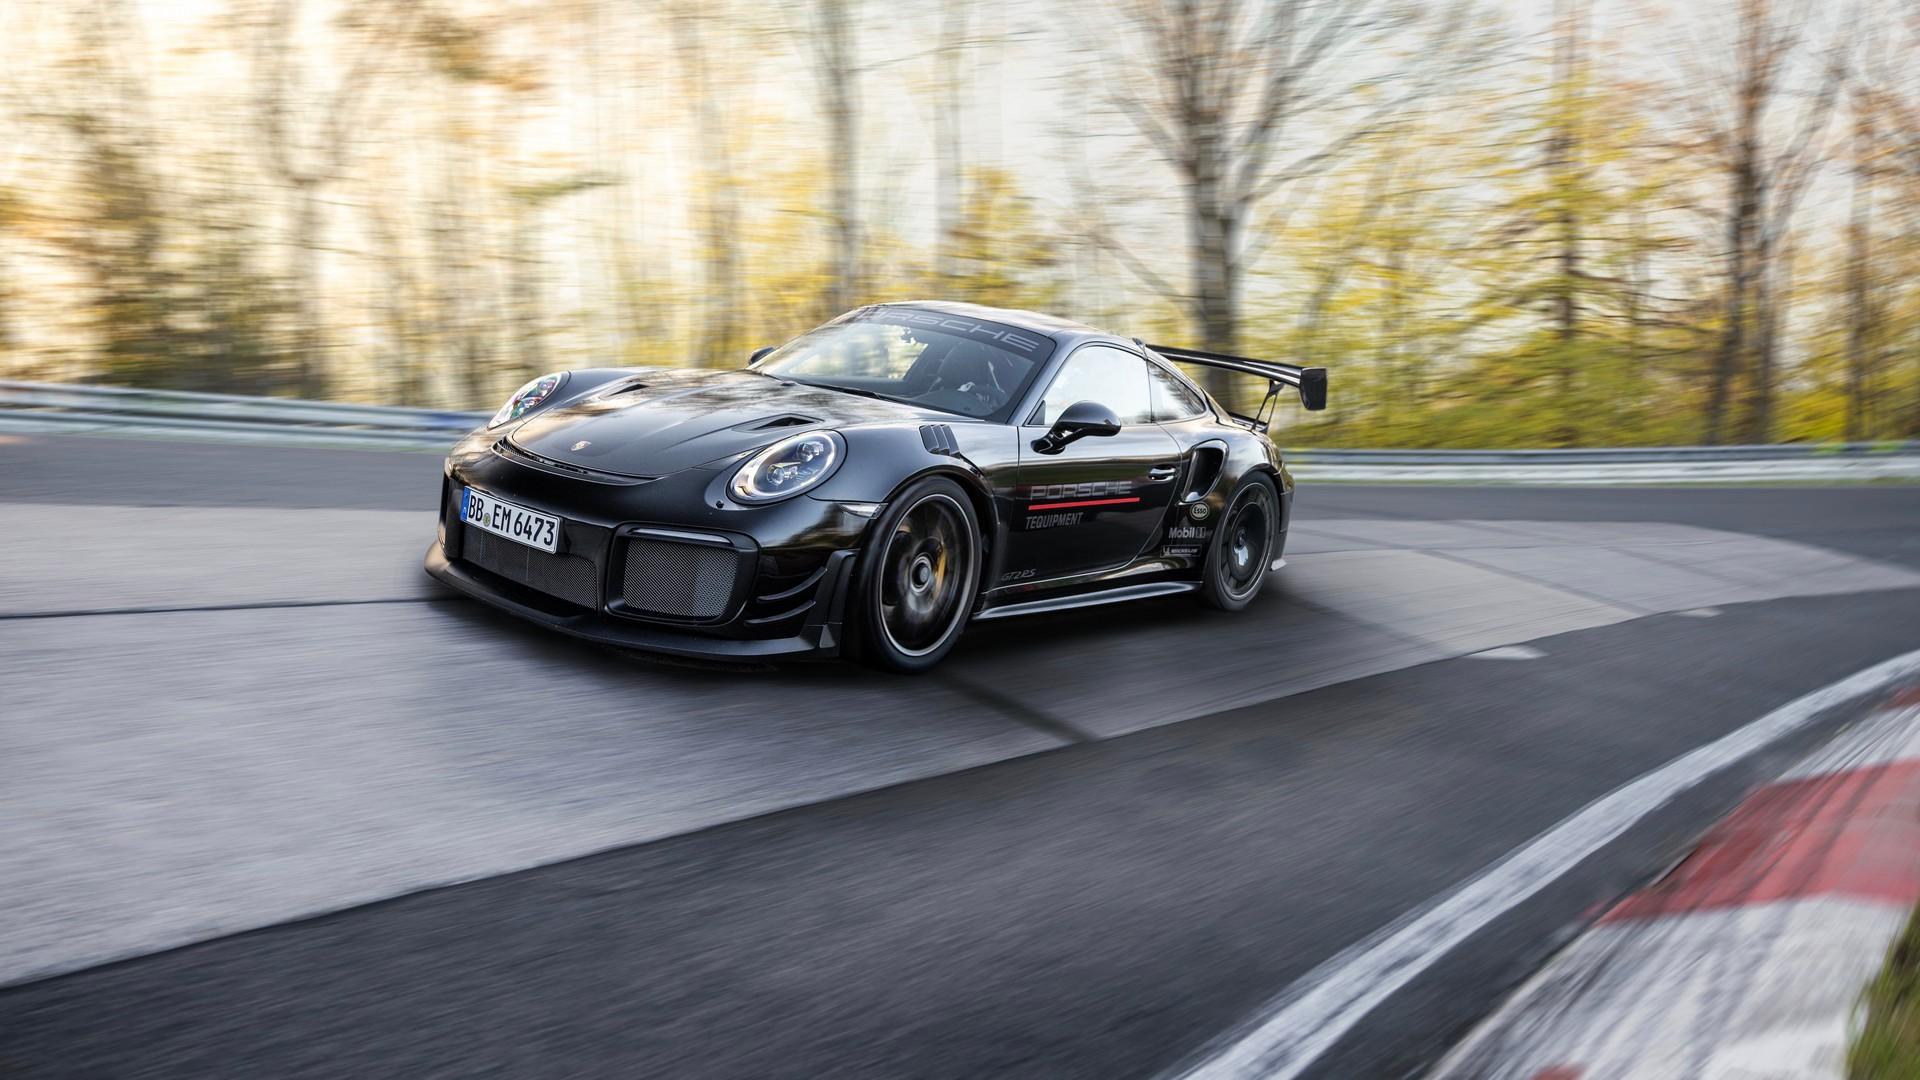 Tuningowane Porsche 911 GT2 RS z rekordem na Nürburgringu